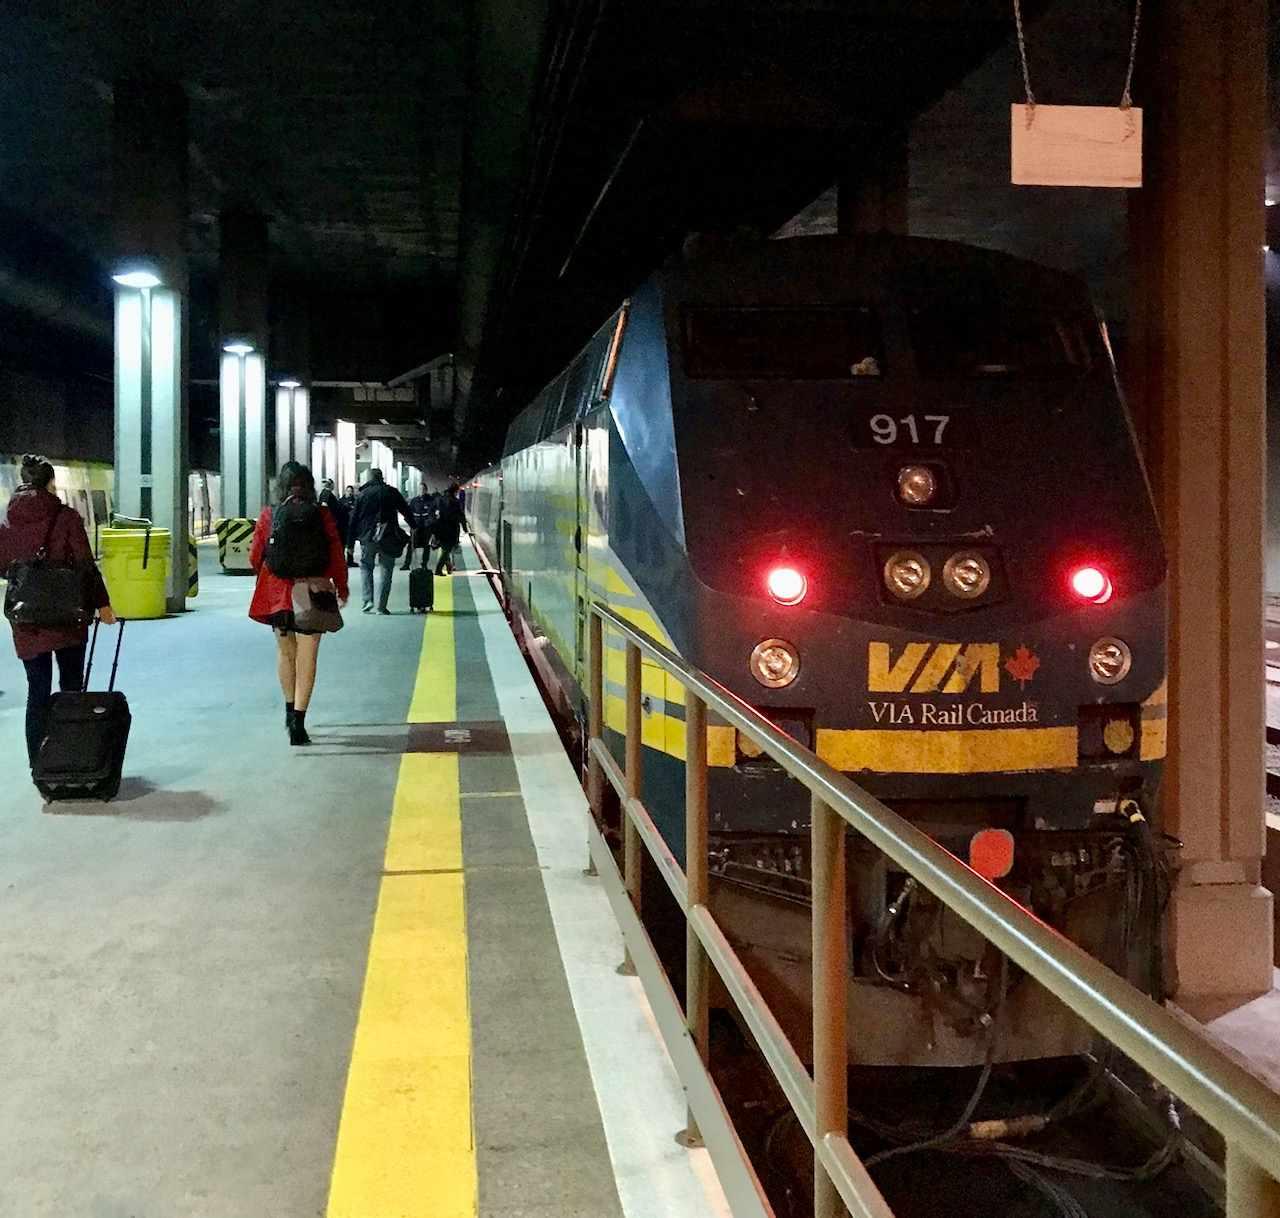 Via train in station